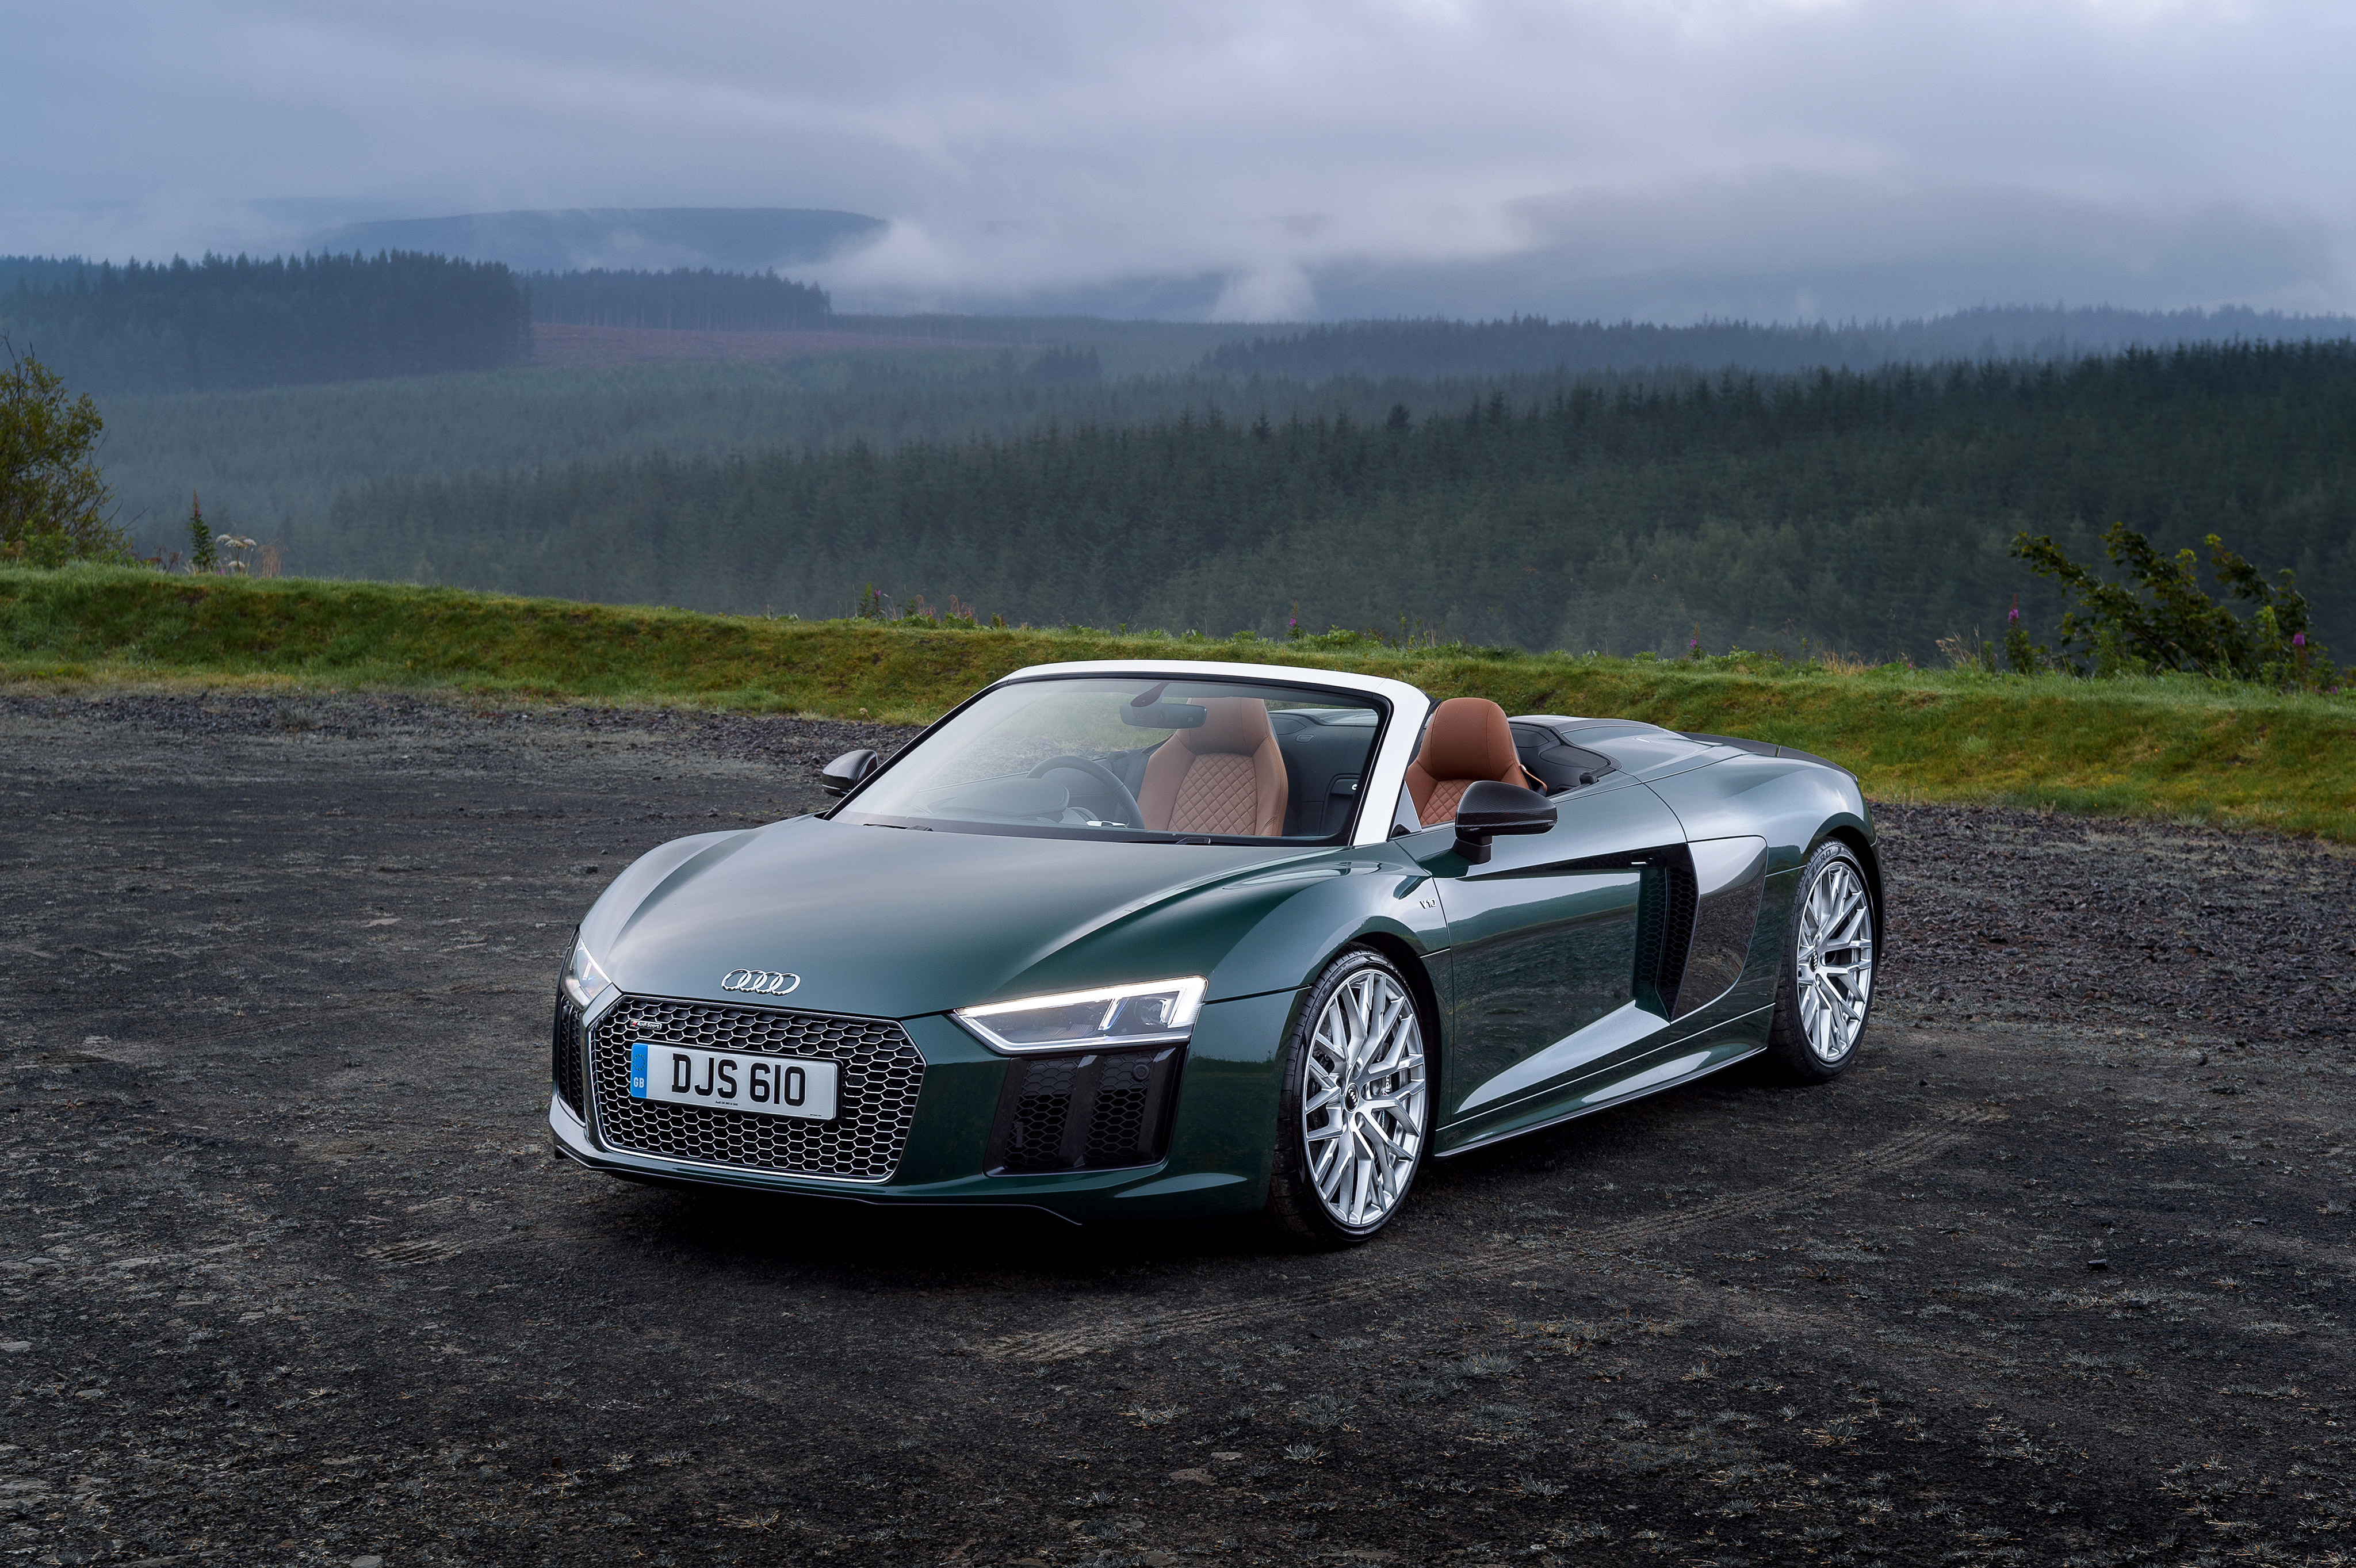 Audi R8 Spyder V10 Plus 2017, HD Cars, 4k Wallpapers ...